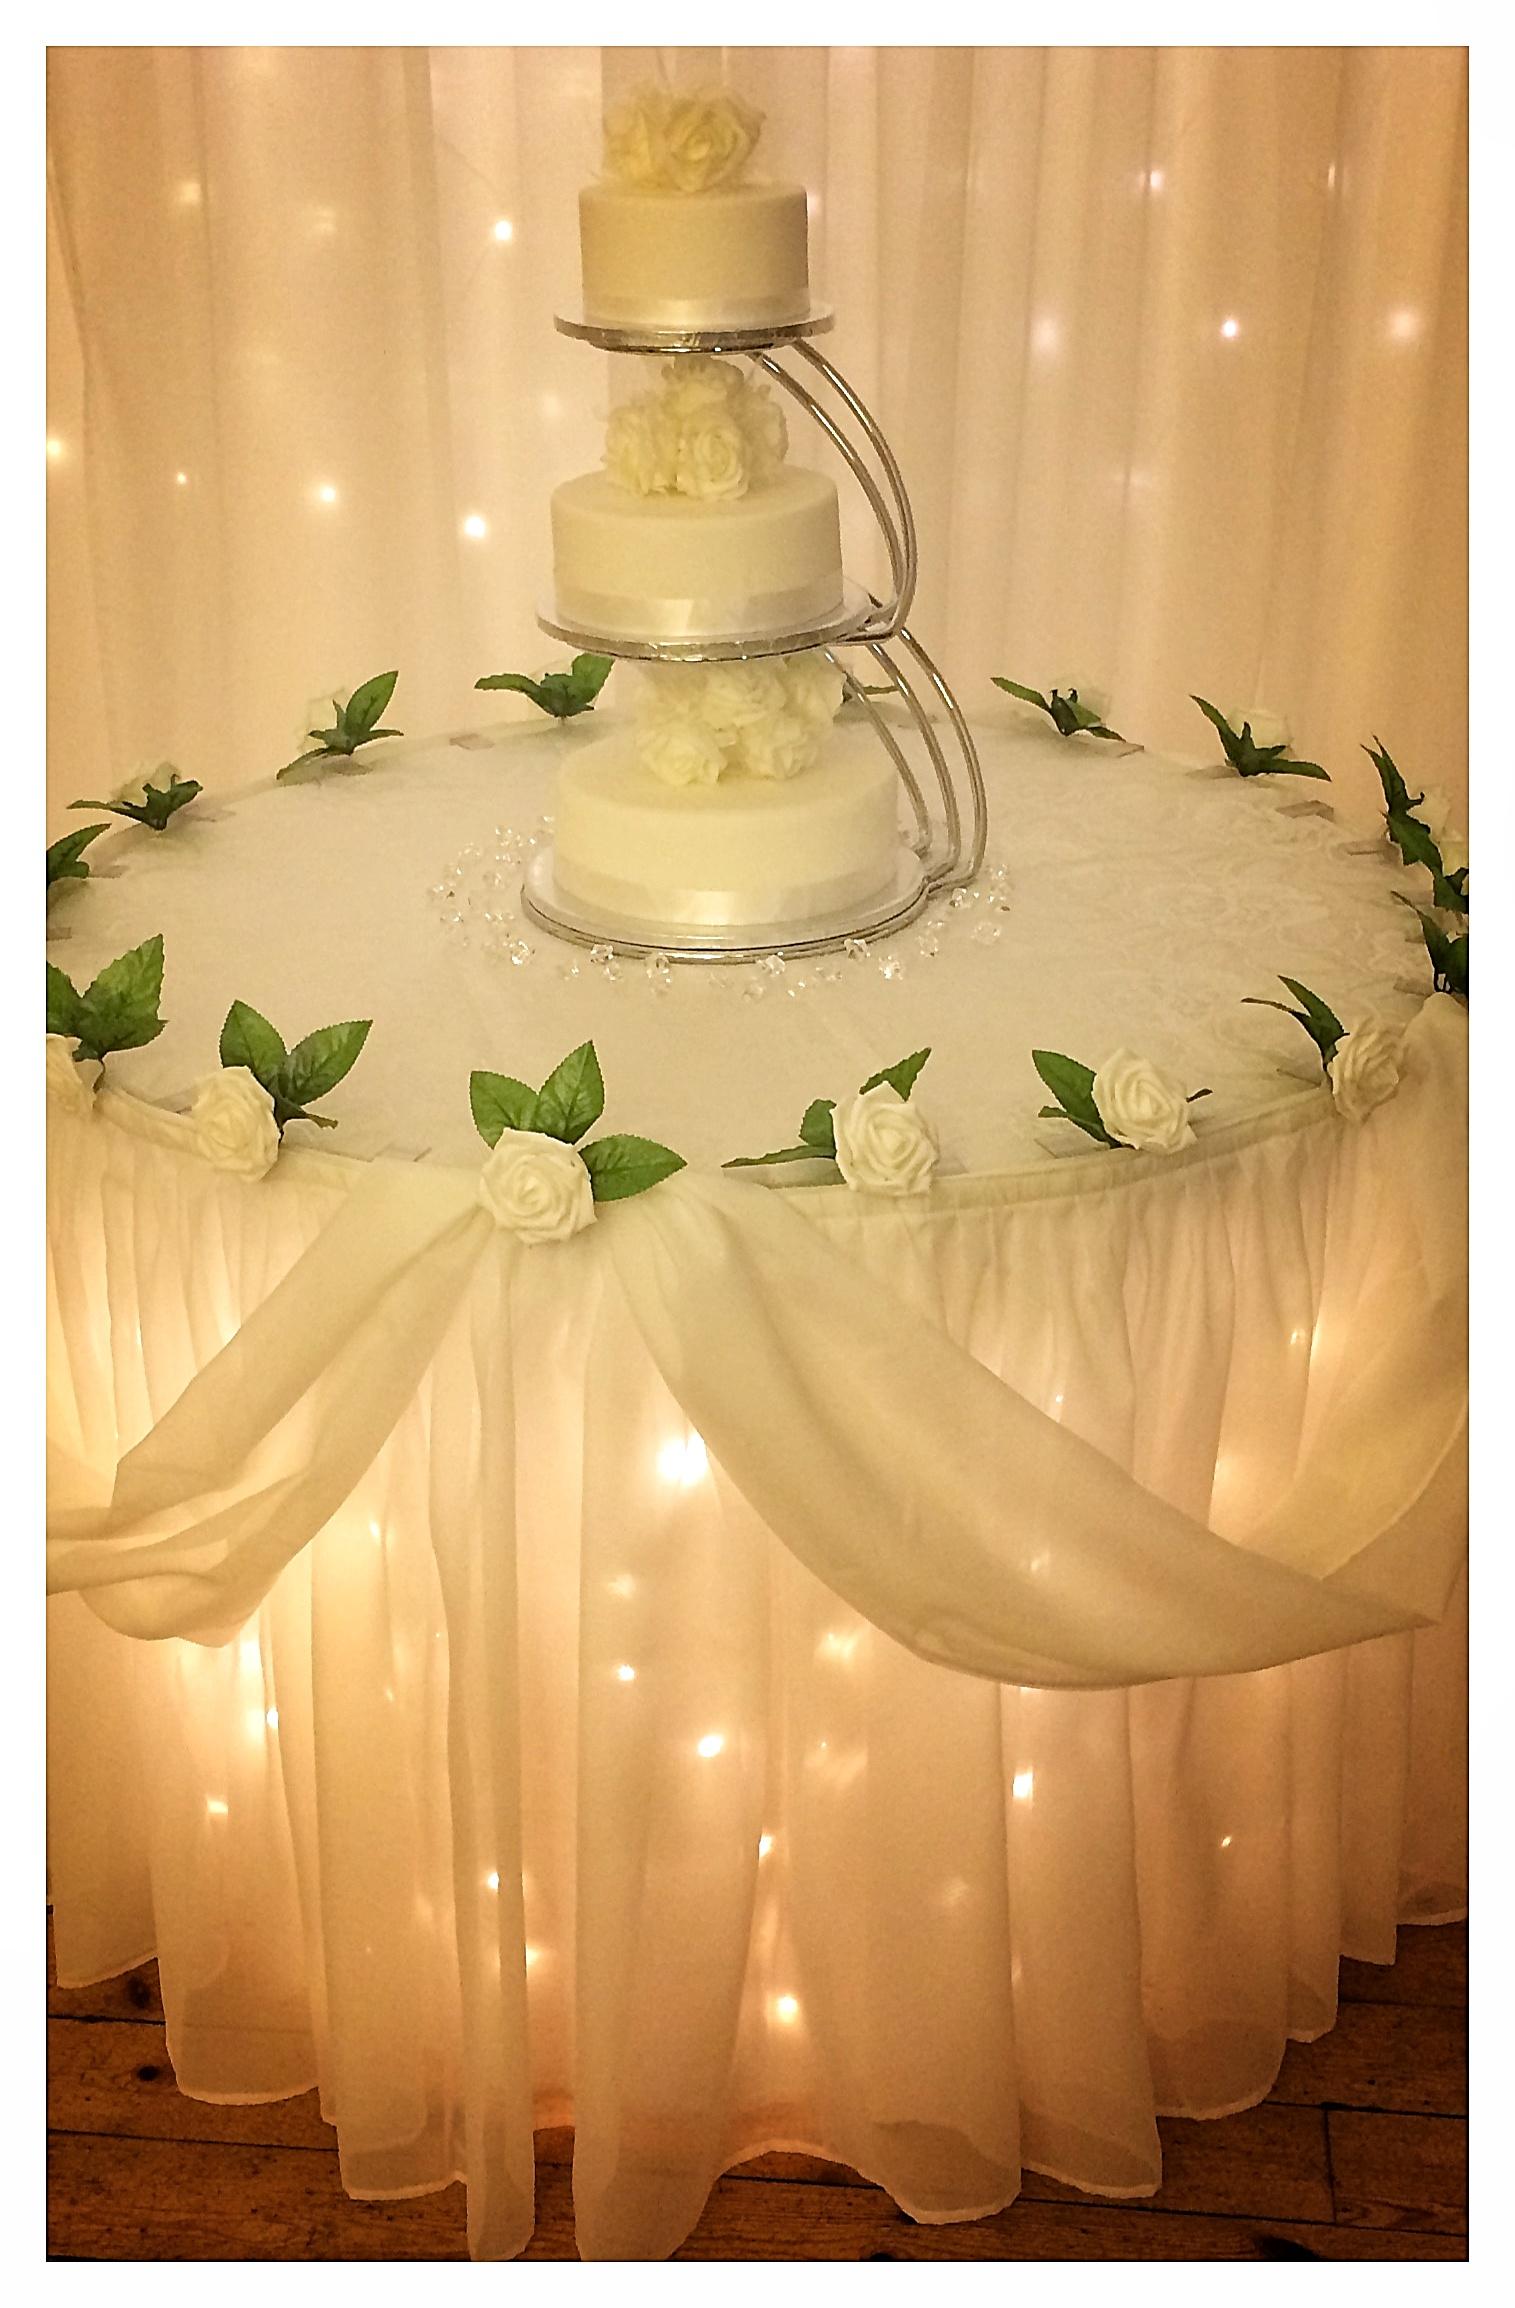 LED-lit Cake Table